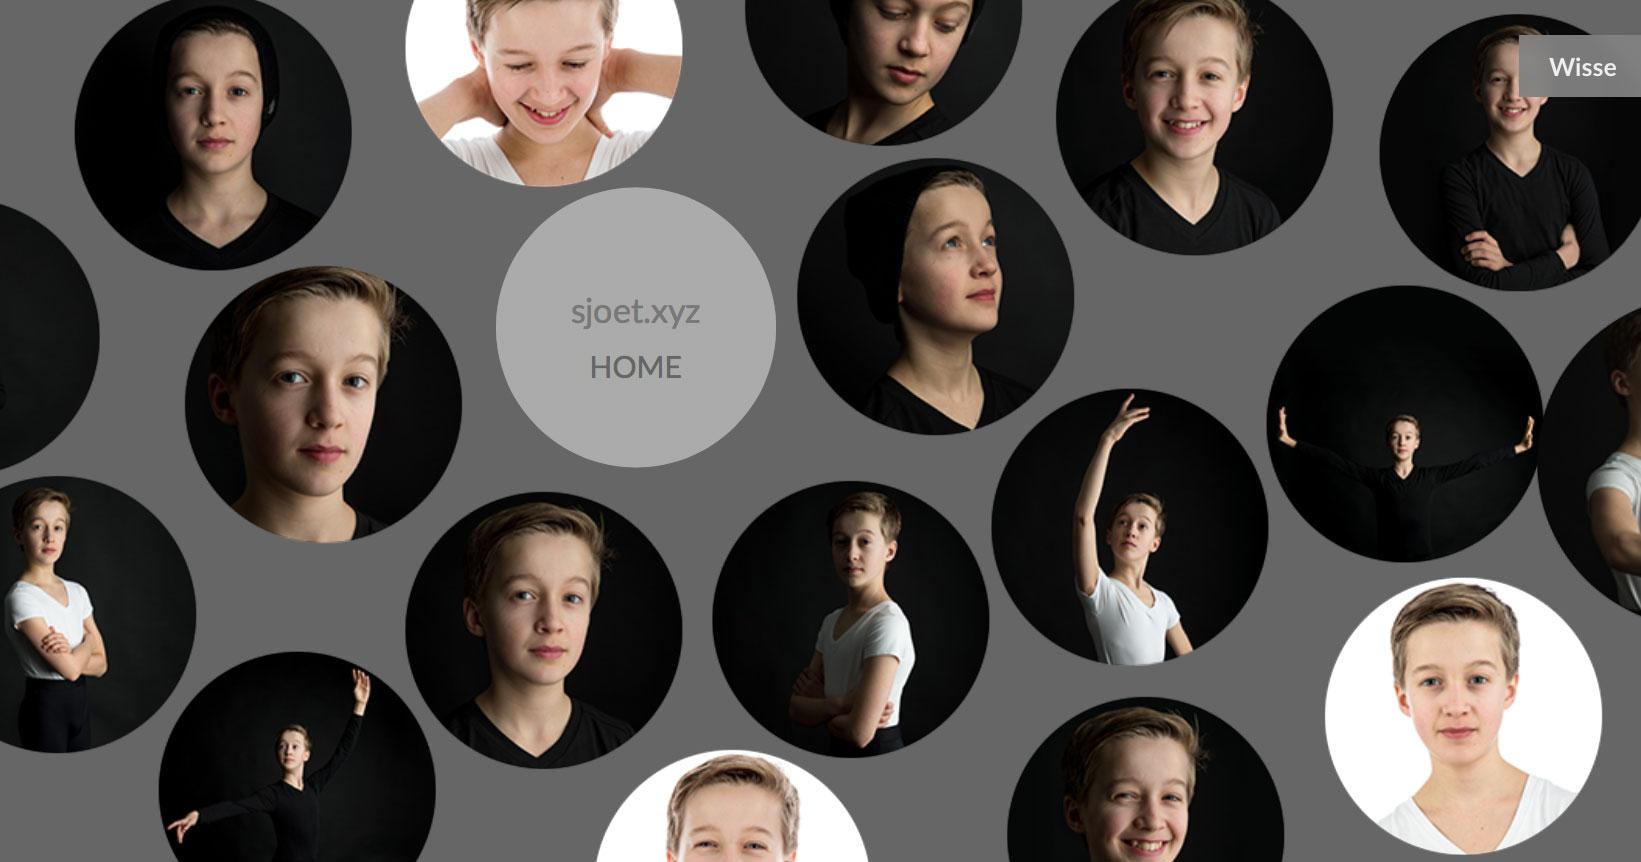 Wisse Scheele | Sjoet.xyz